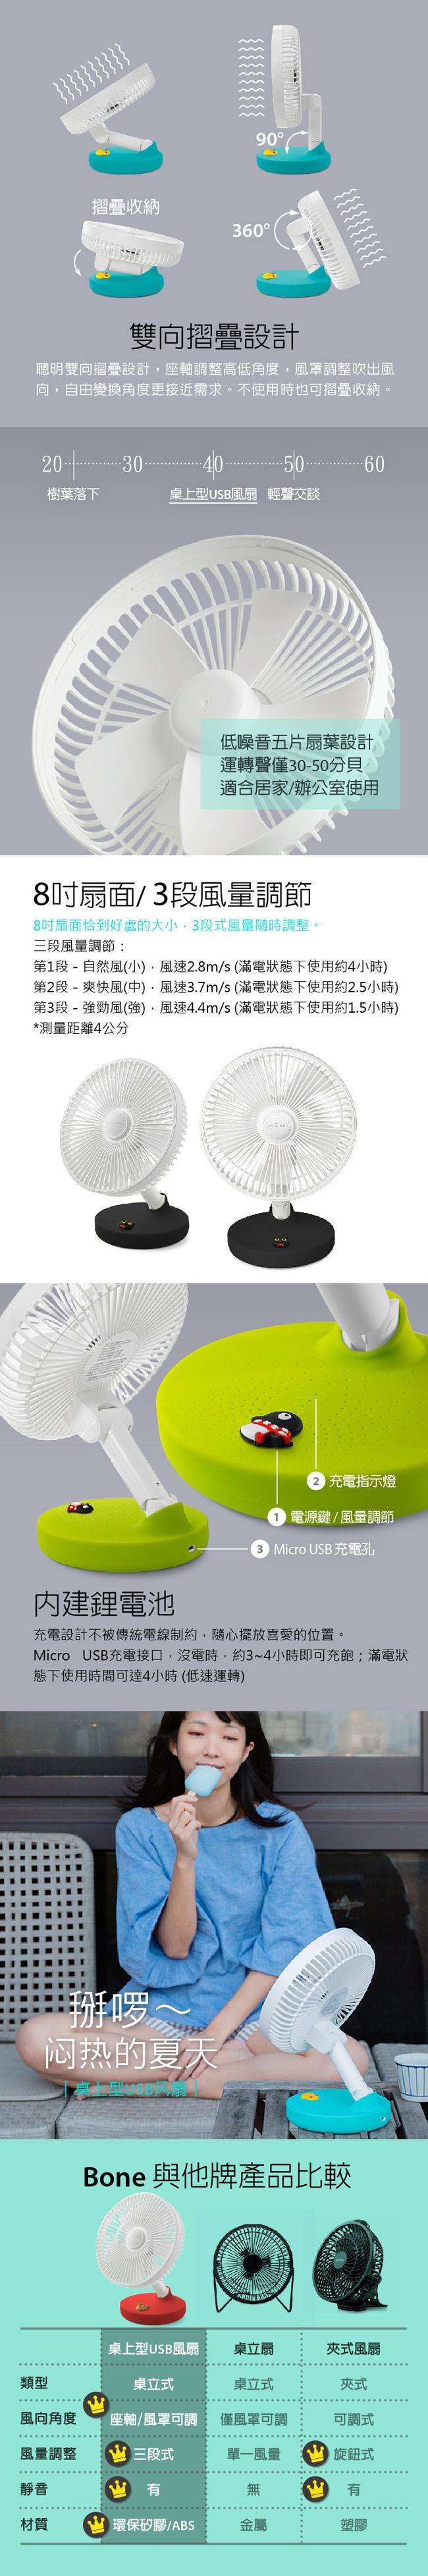 Bone|桌上型USB風扇 / USB Desk Fan - 喵喵貓